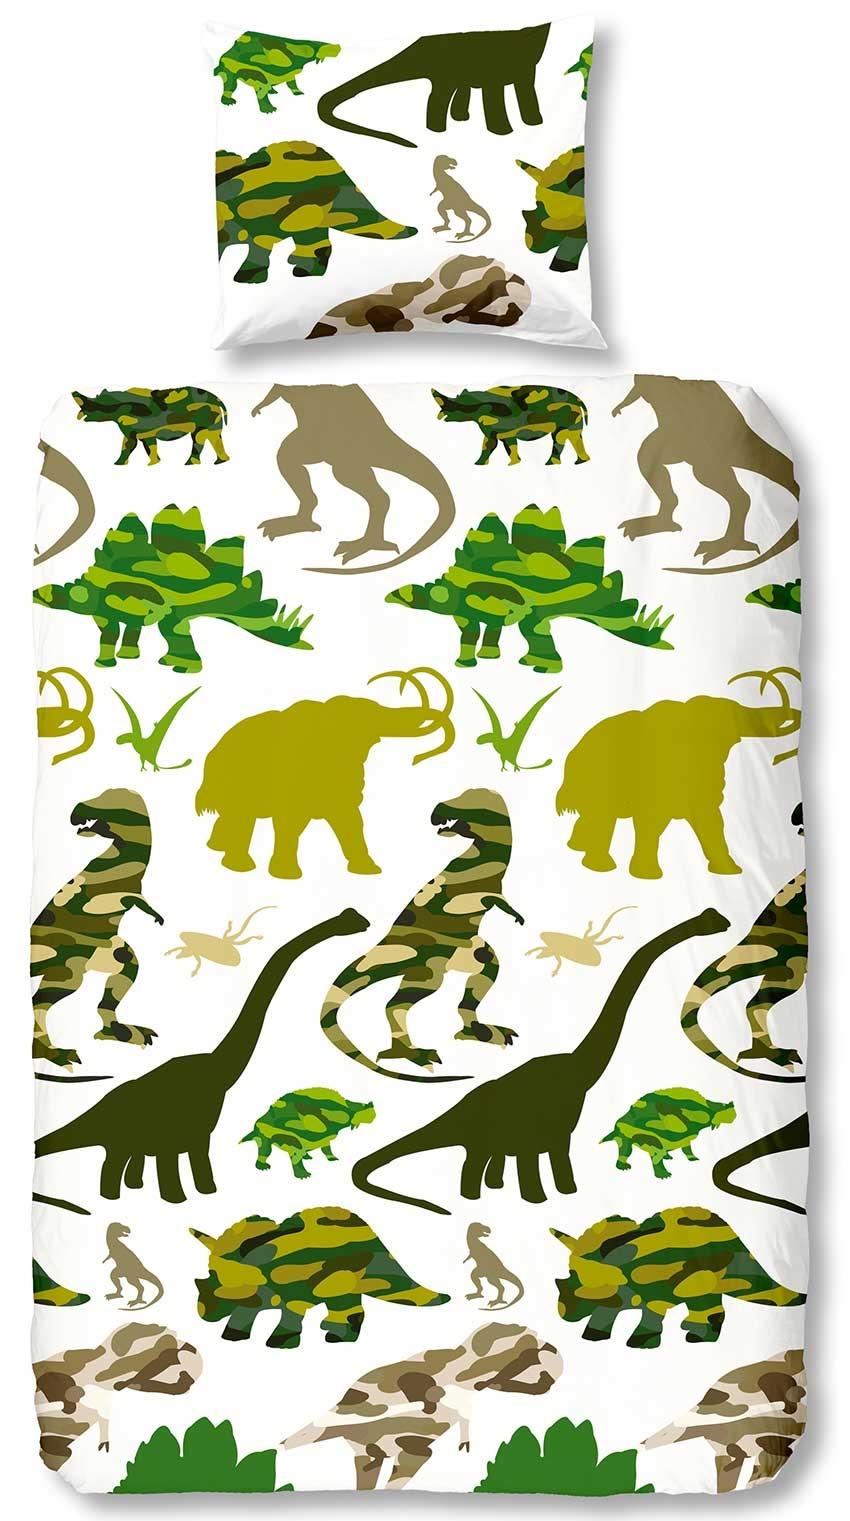 Goodmorning Dekbedovertrek Dinosaurus